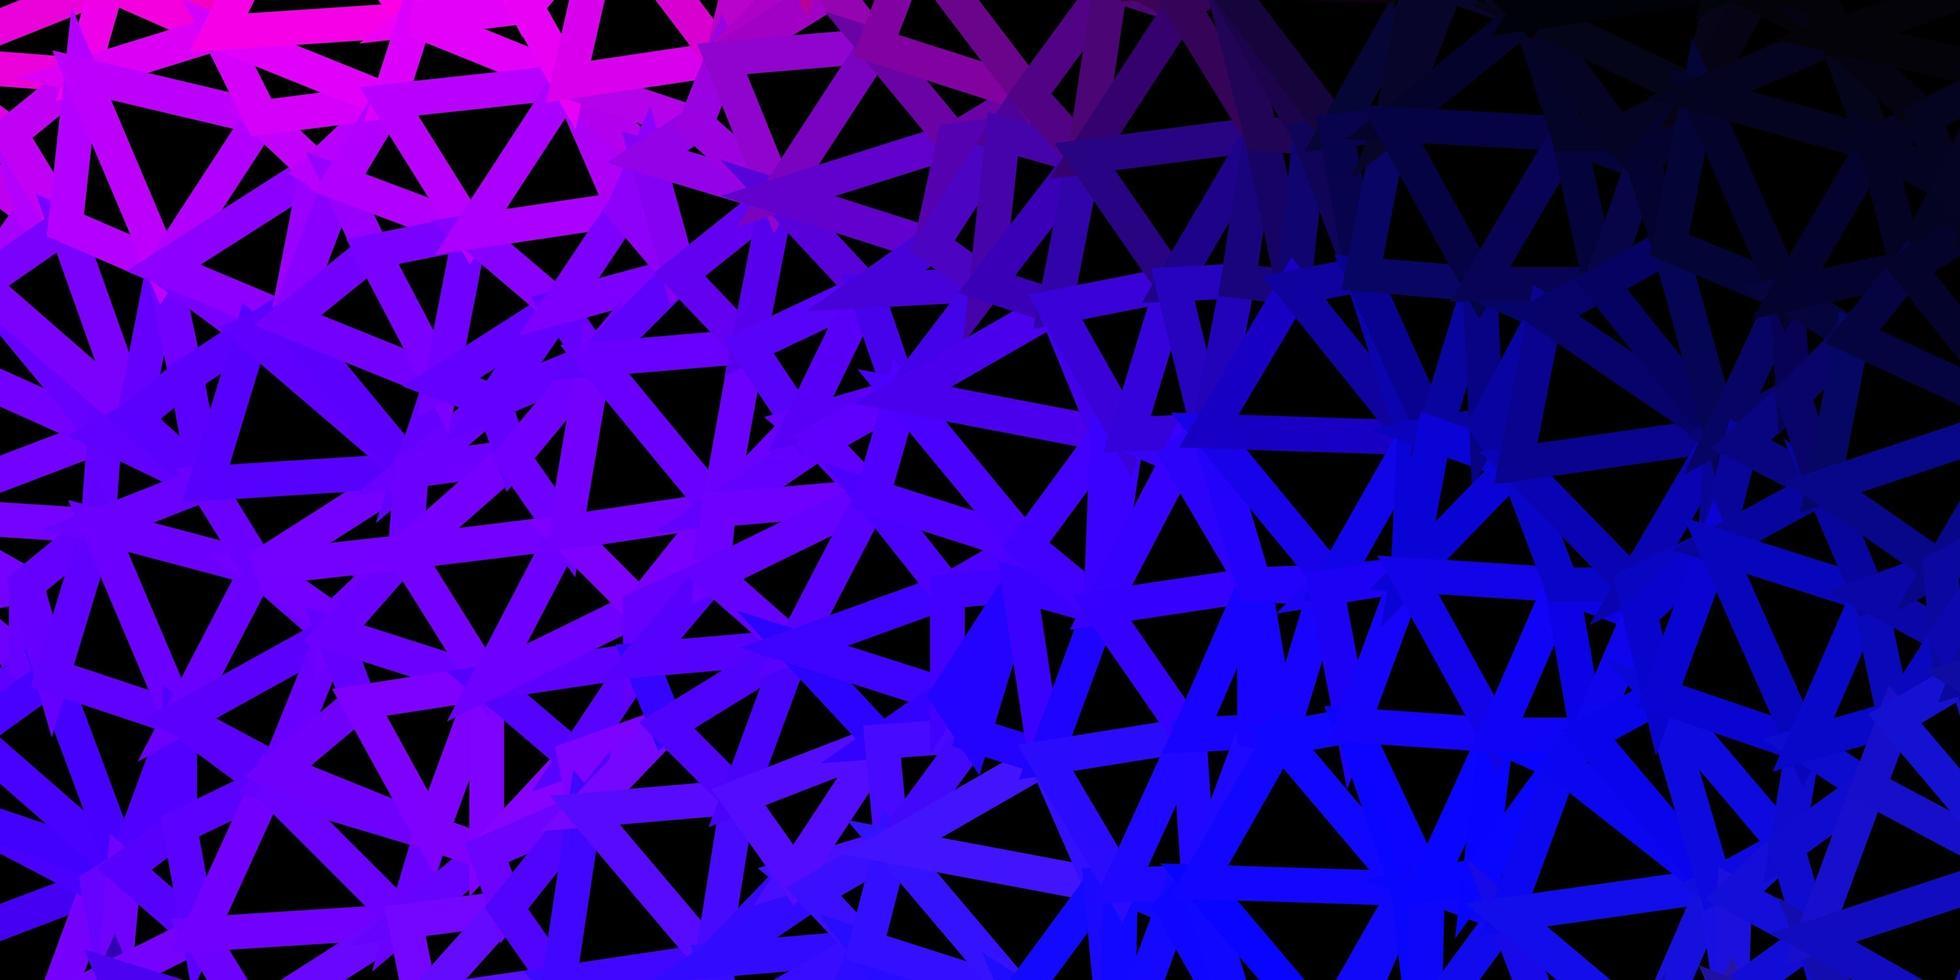 papel de parede poligonal geométrico de vetor rosa escuro, azul.